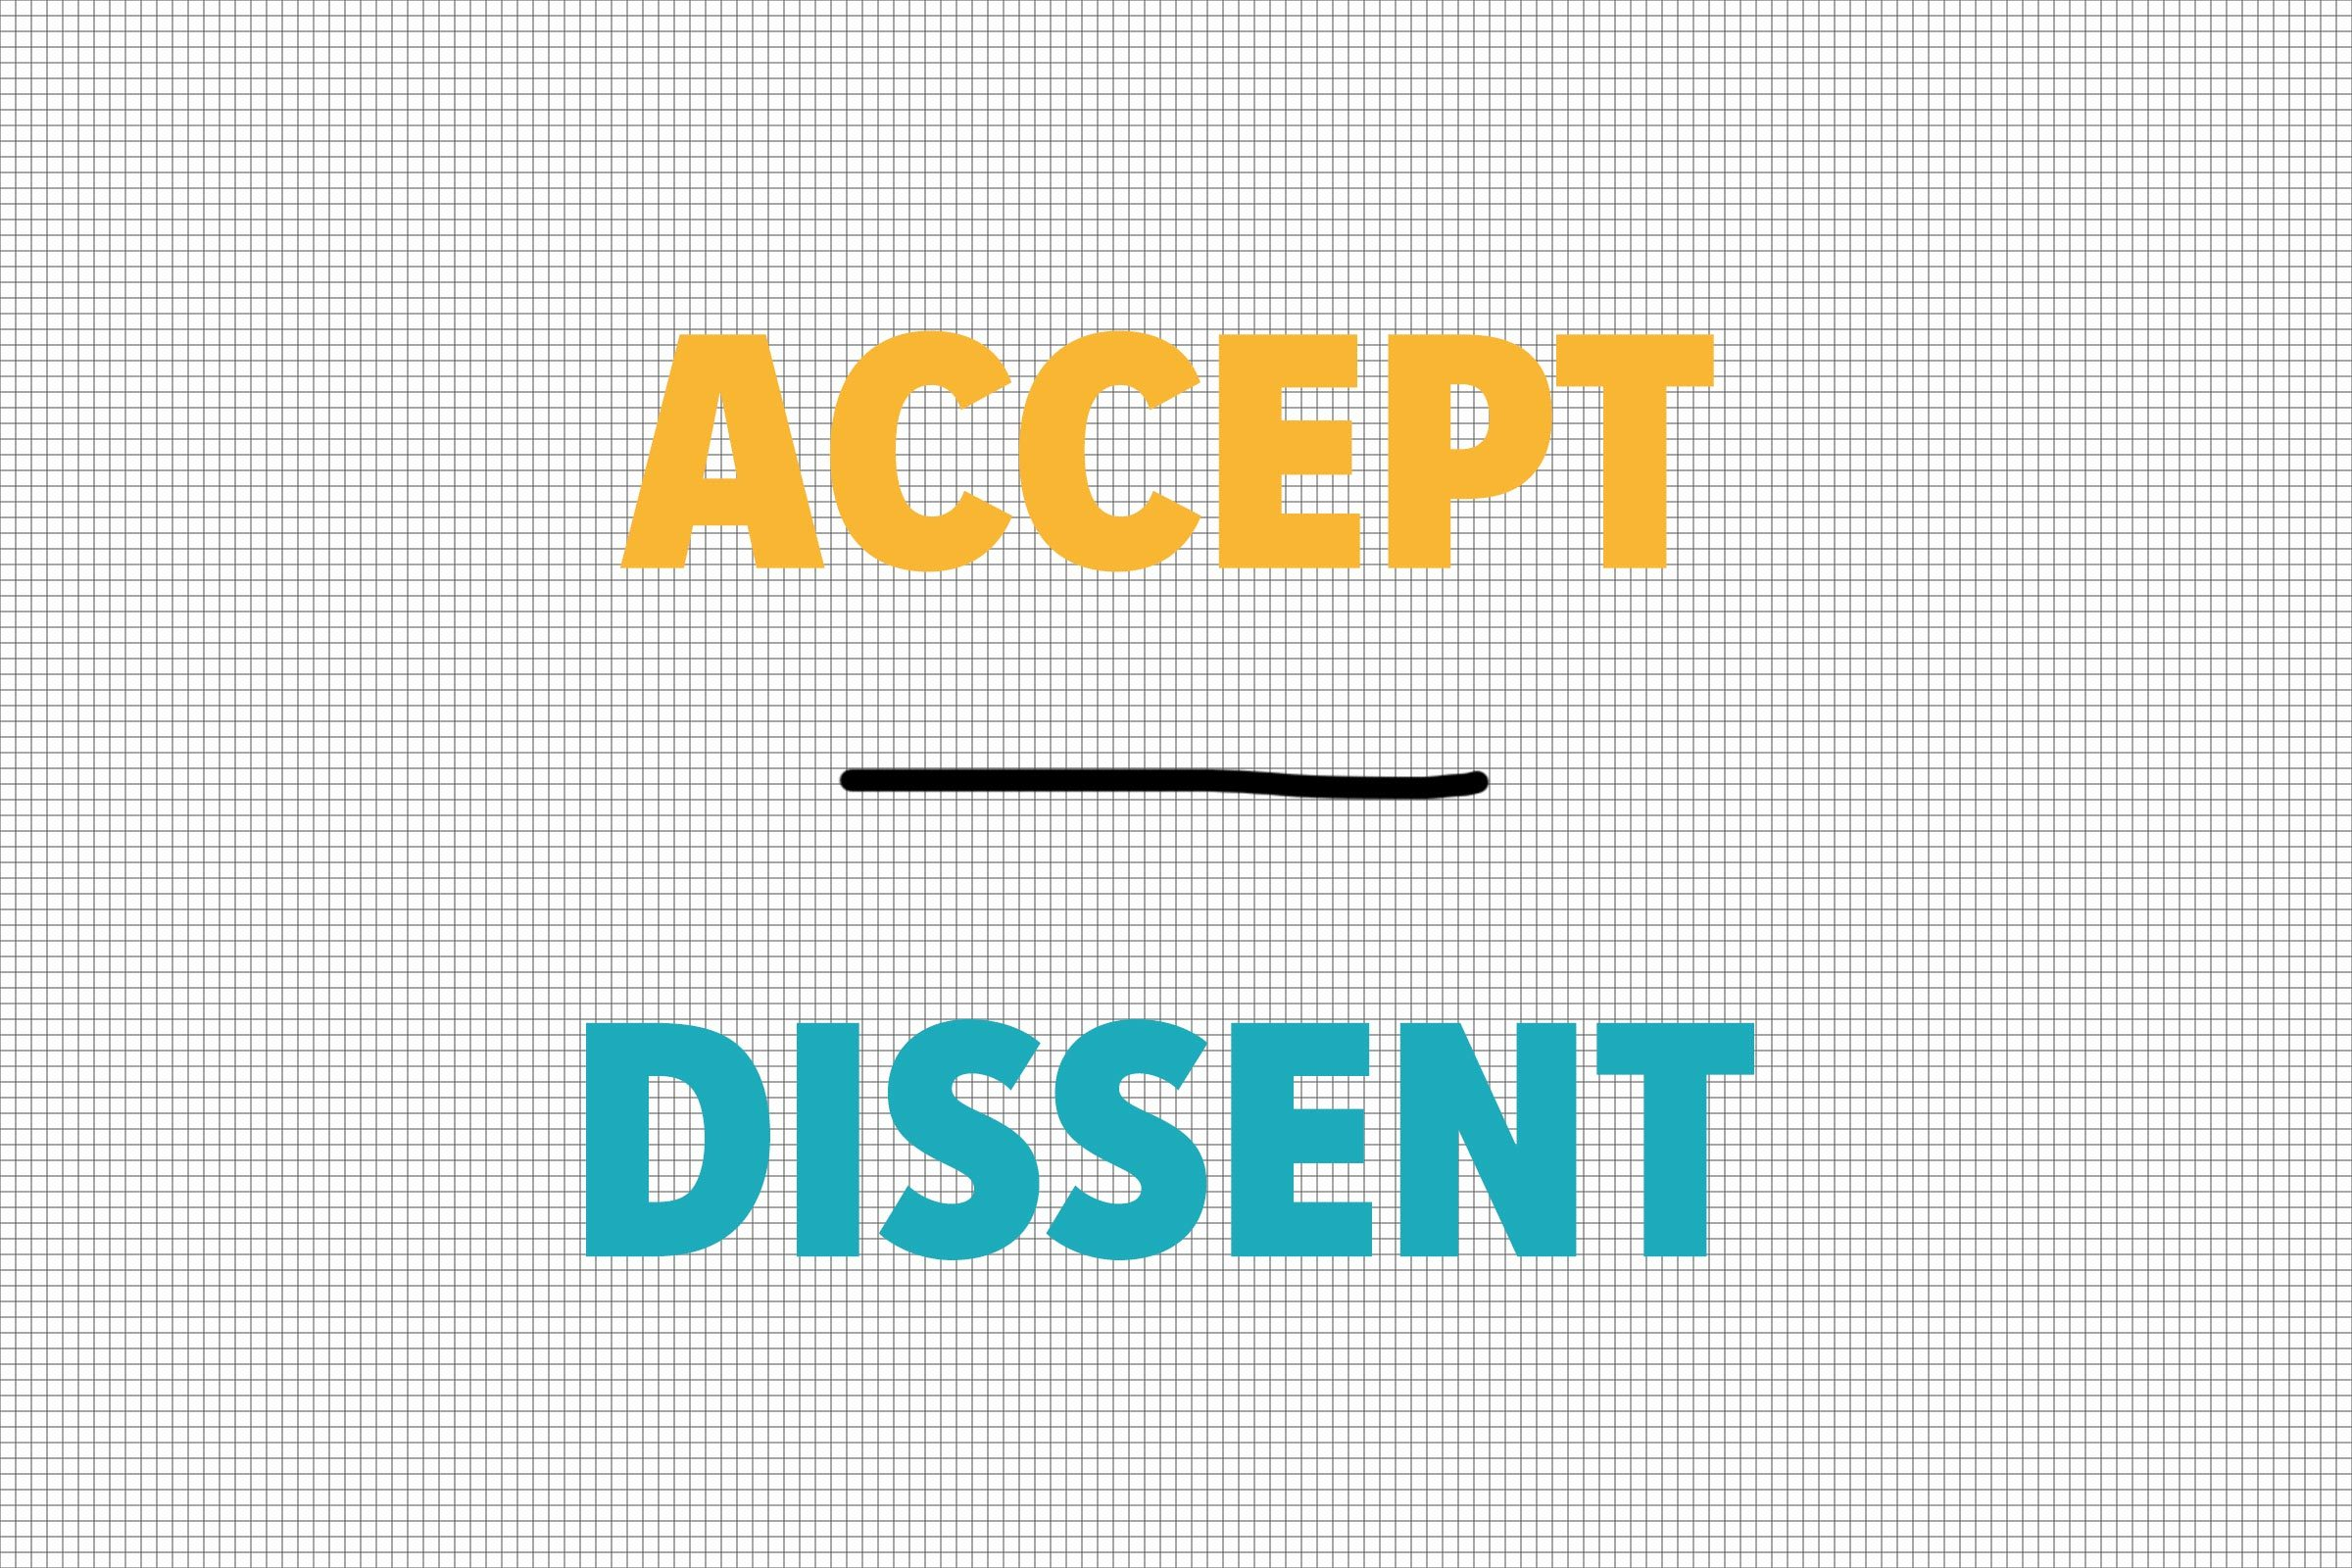 Accept/Dissent